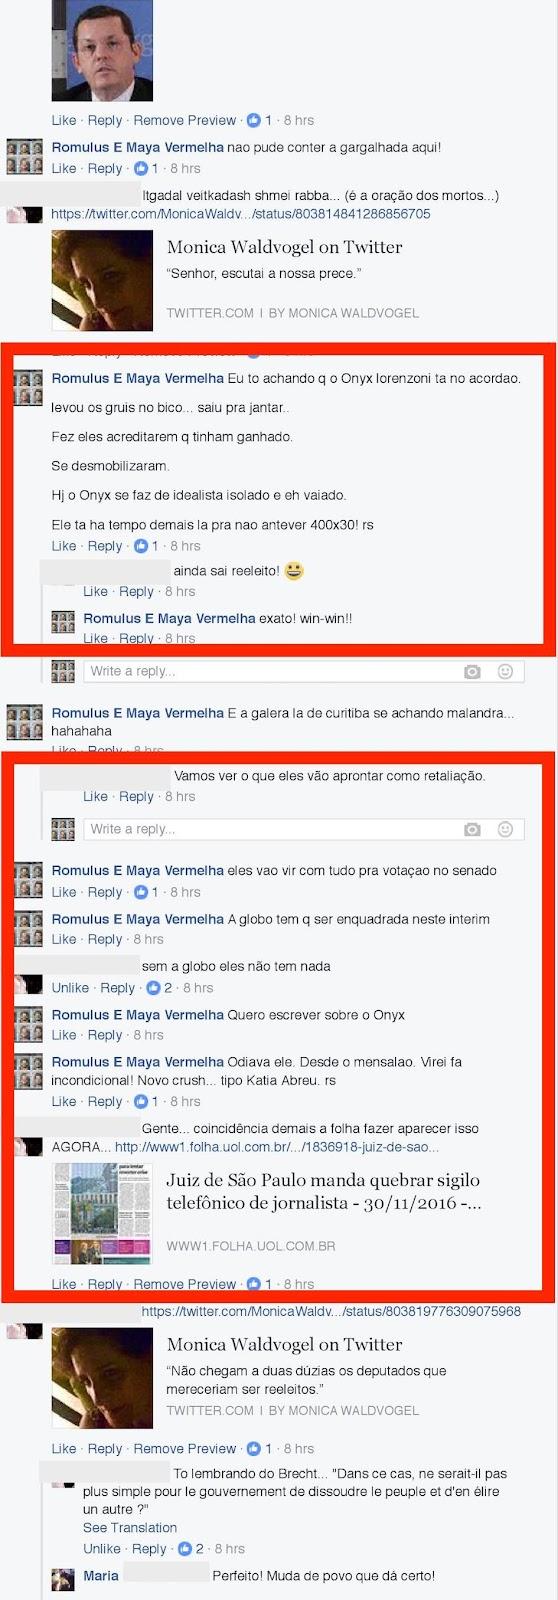 /Users/romulosoaresbrillo/Desktop/(52) Amigos de Maya : Romulus (blog do Nassif)/(52) Amigos de Maya : Romulus (blog do Nassif)_000007.jpg